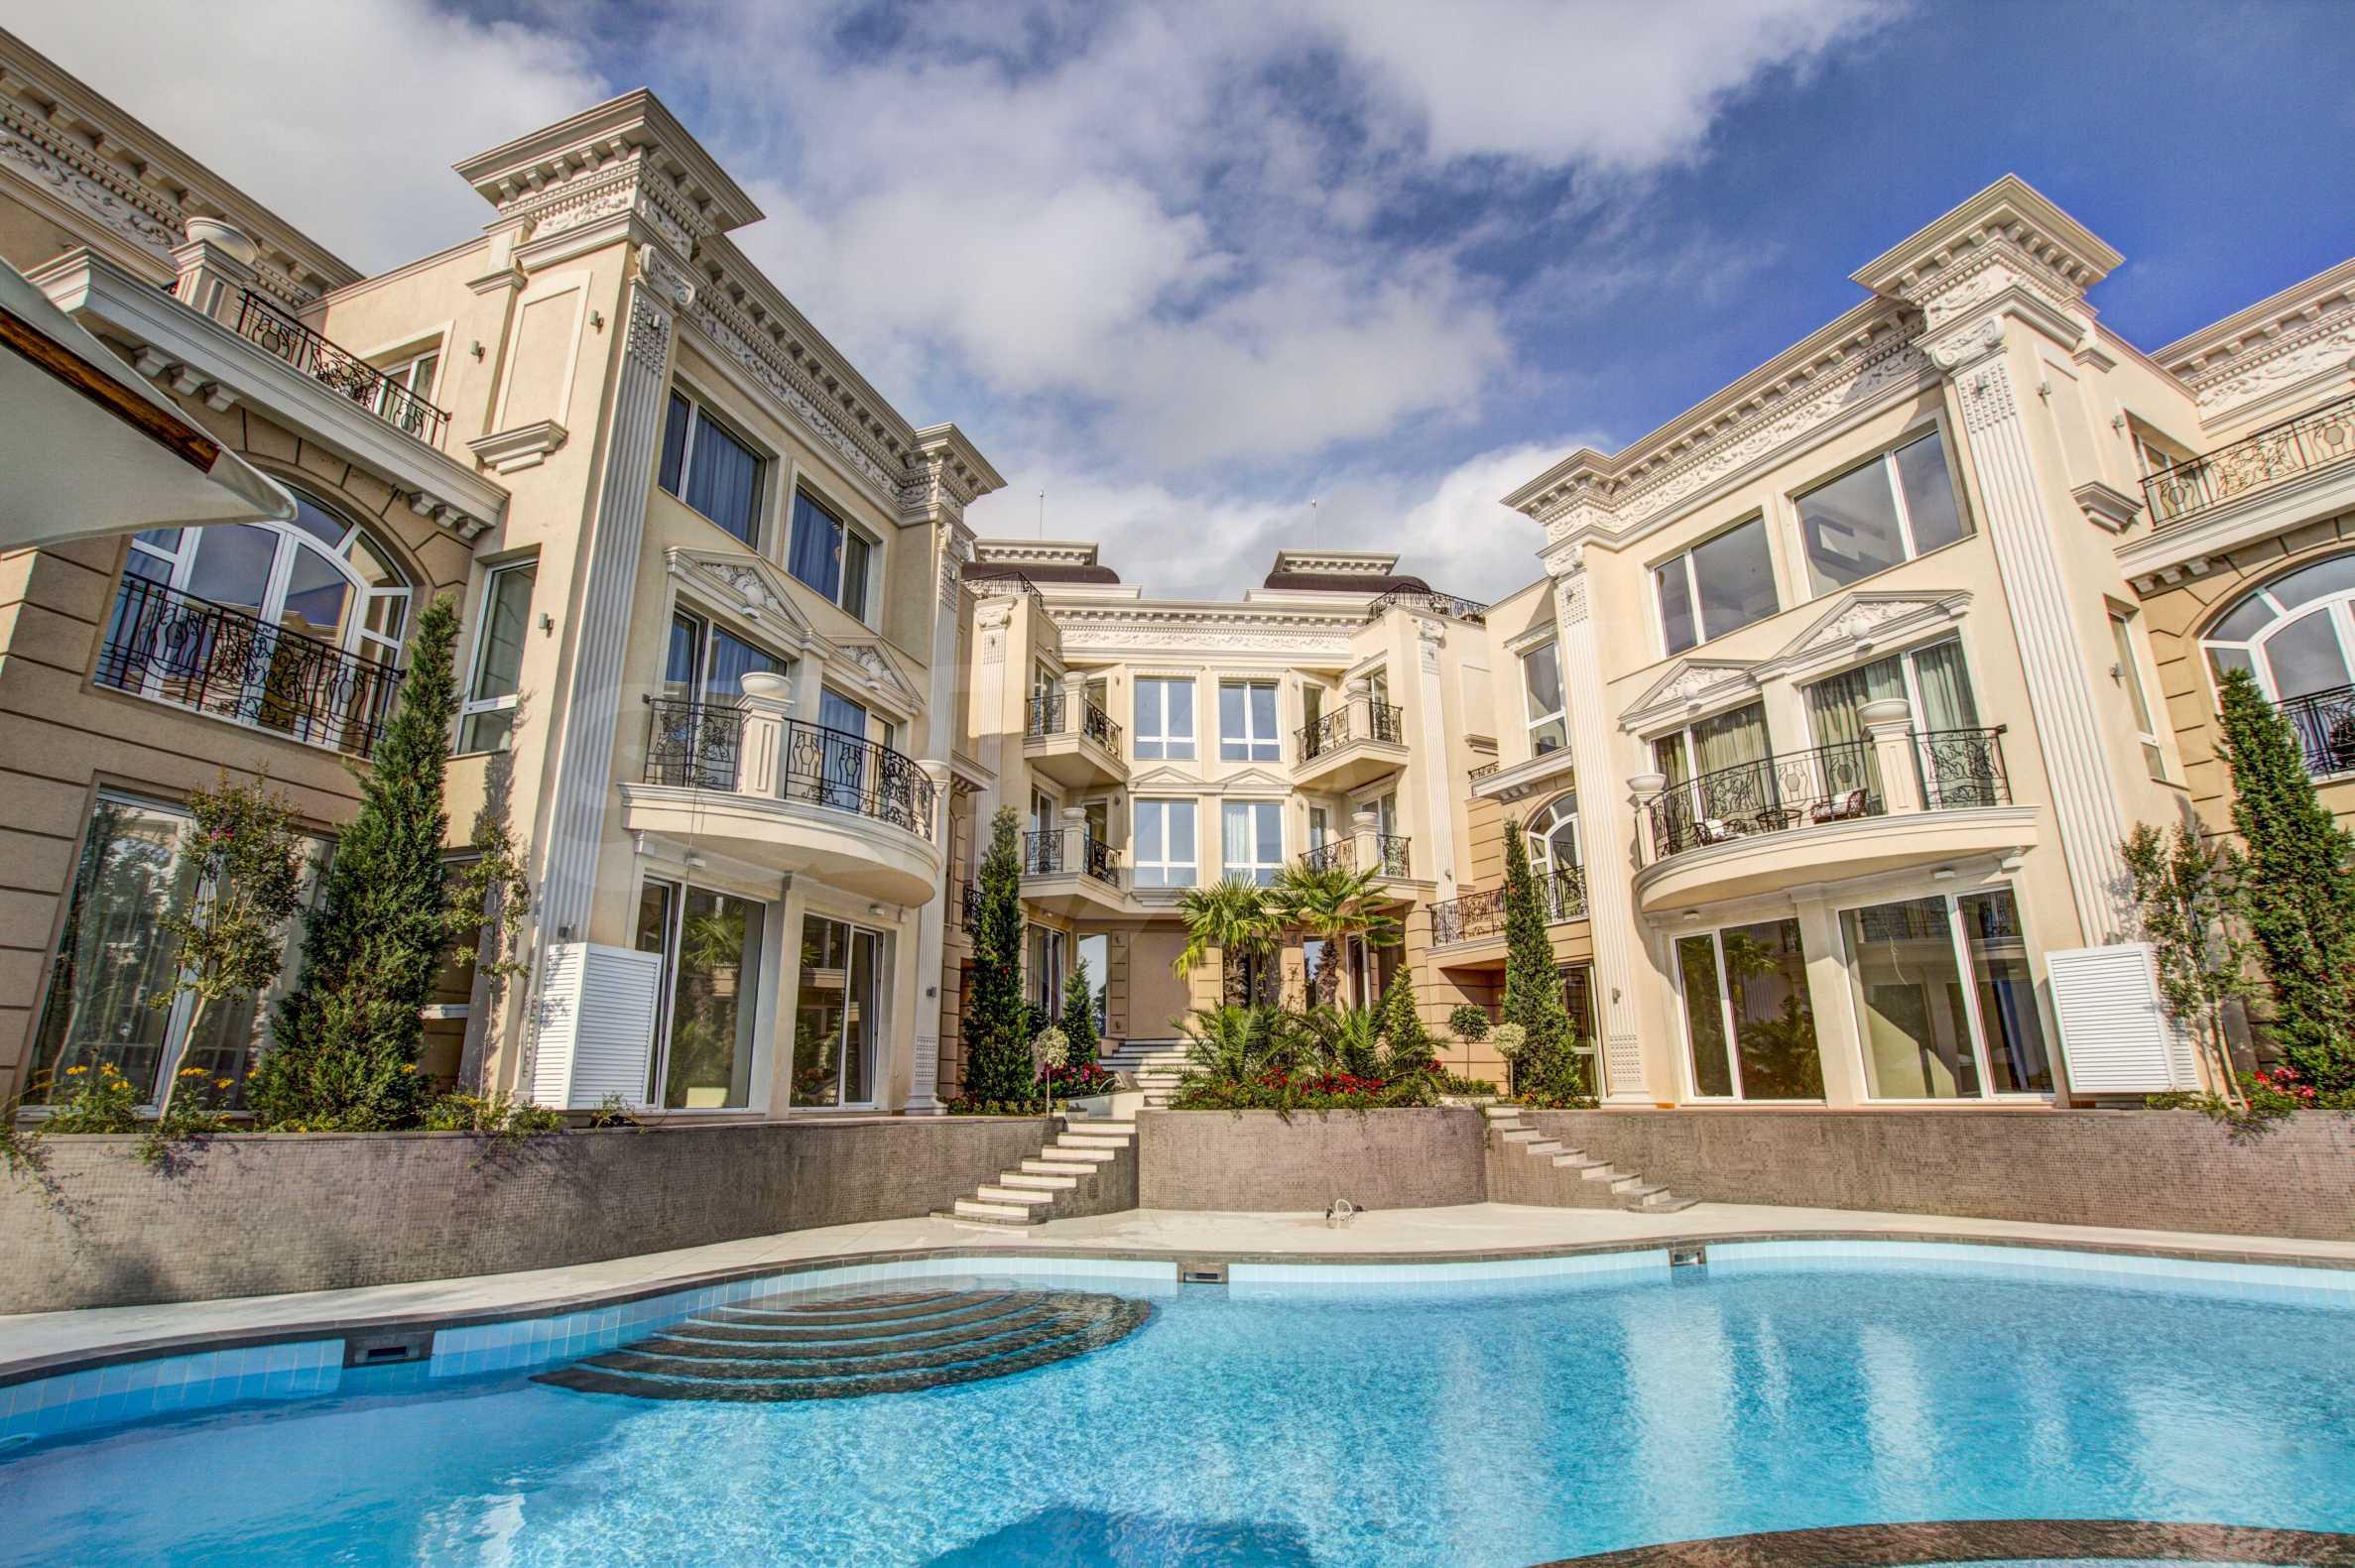 Първокласен двустаен апартамент в Belle Époque Beach Residence (ап. №A 206) 3